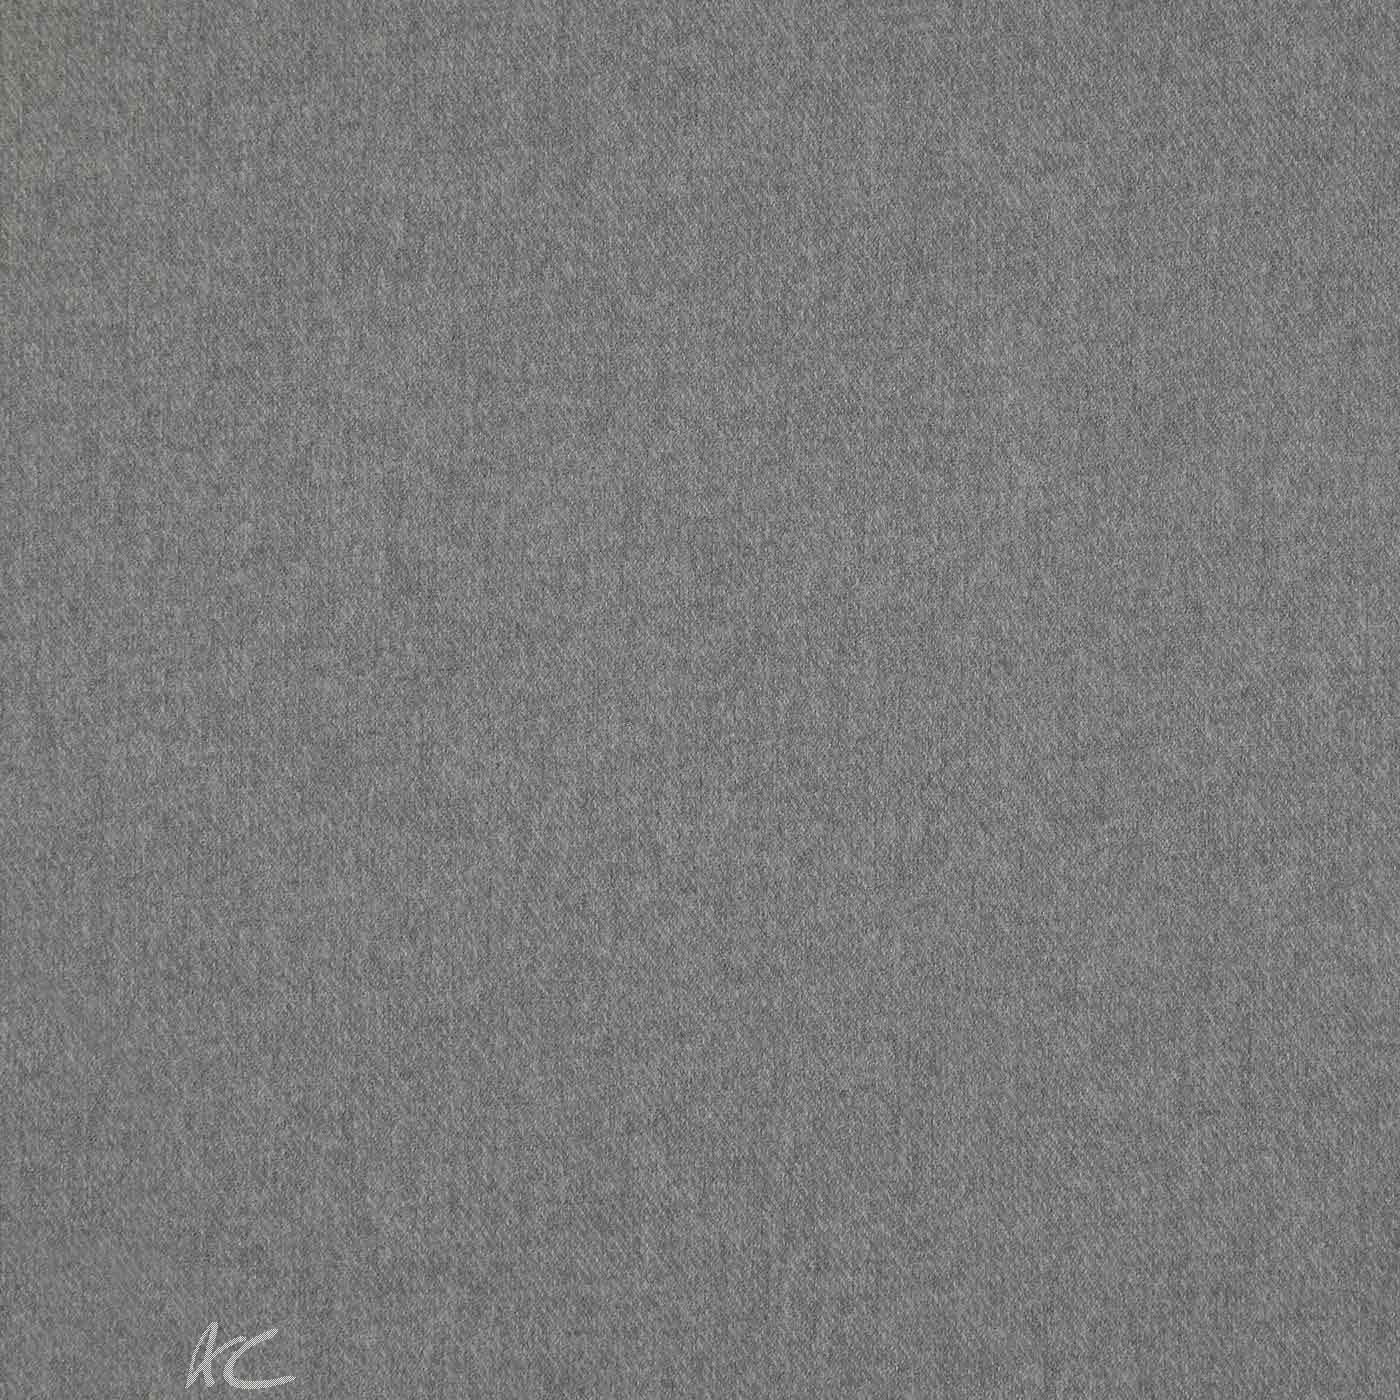 Prestigious Textiles Finlay Silver Curtain Fabric